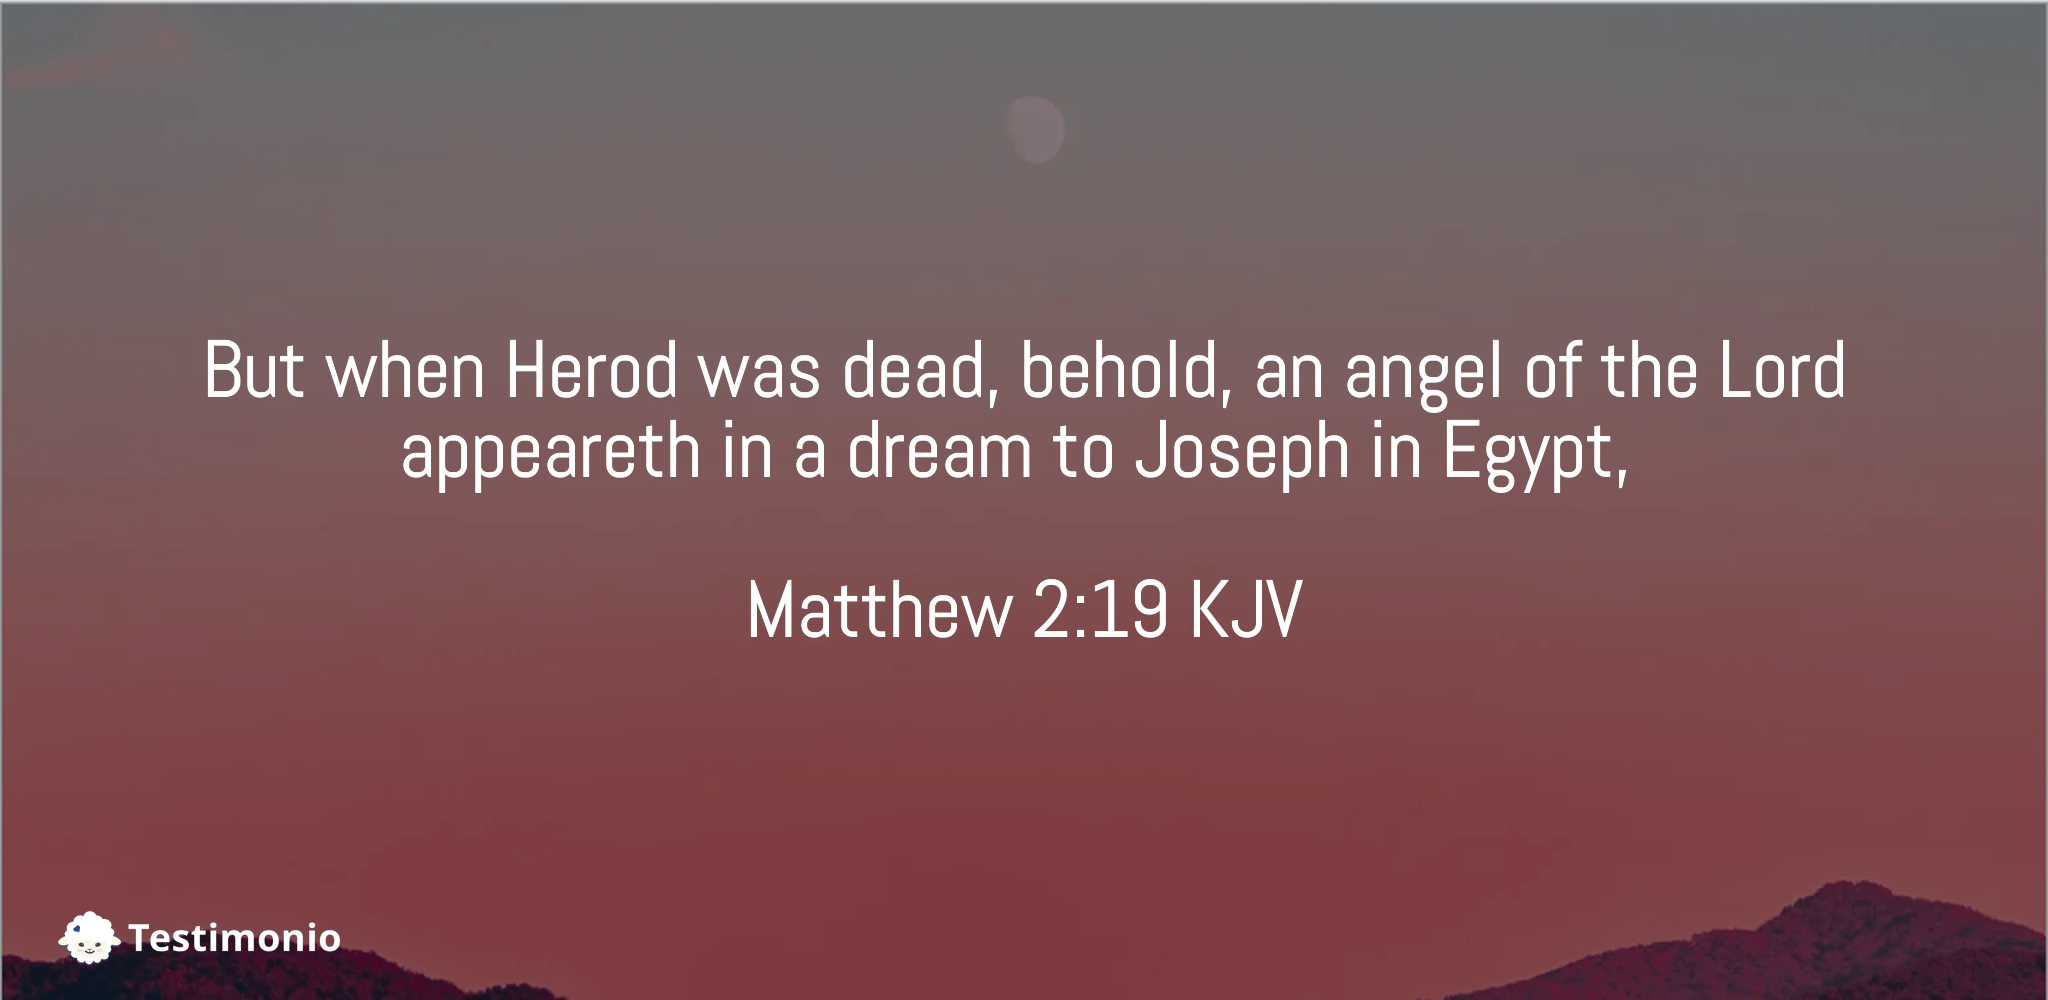 Matthew 2:19